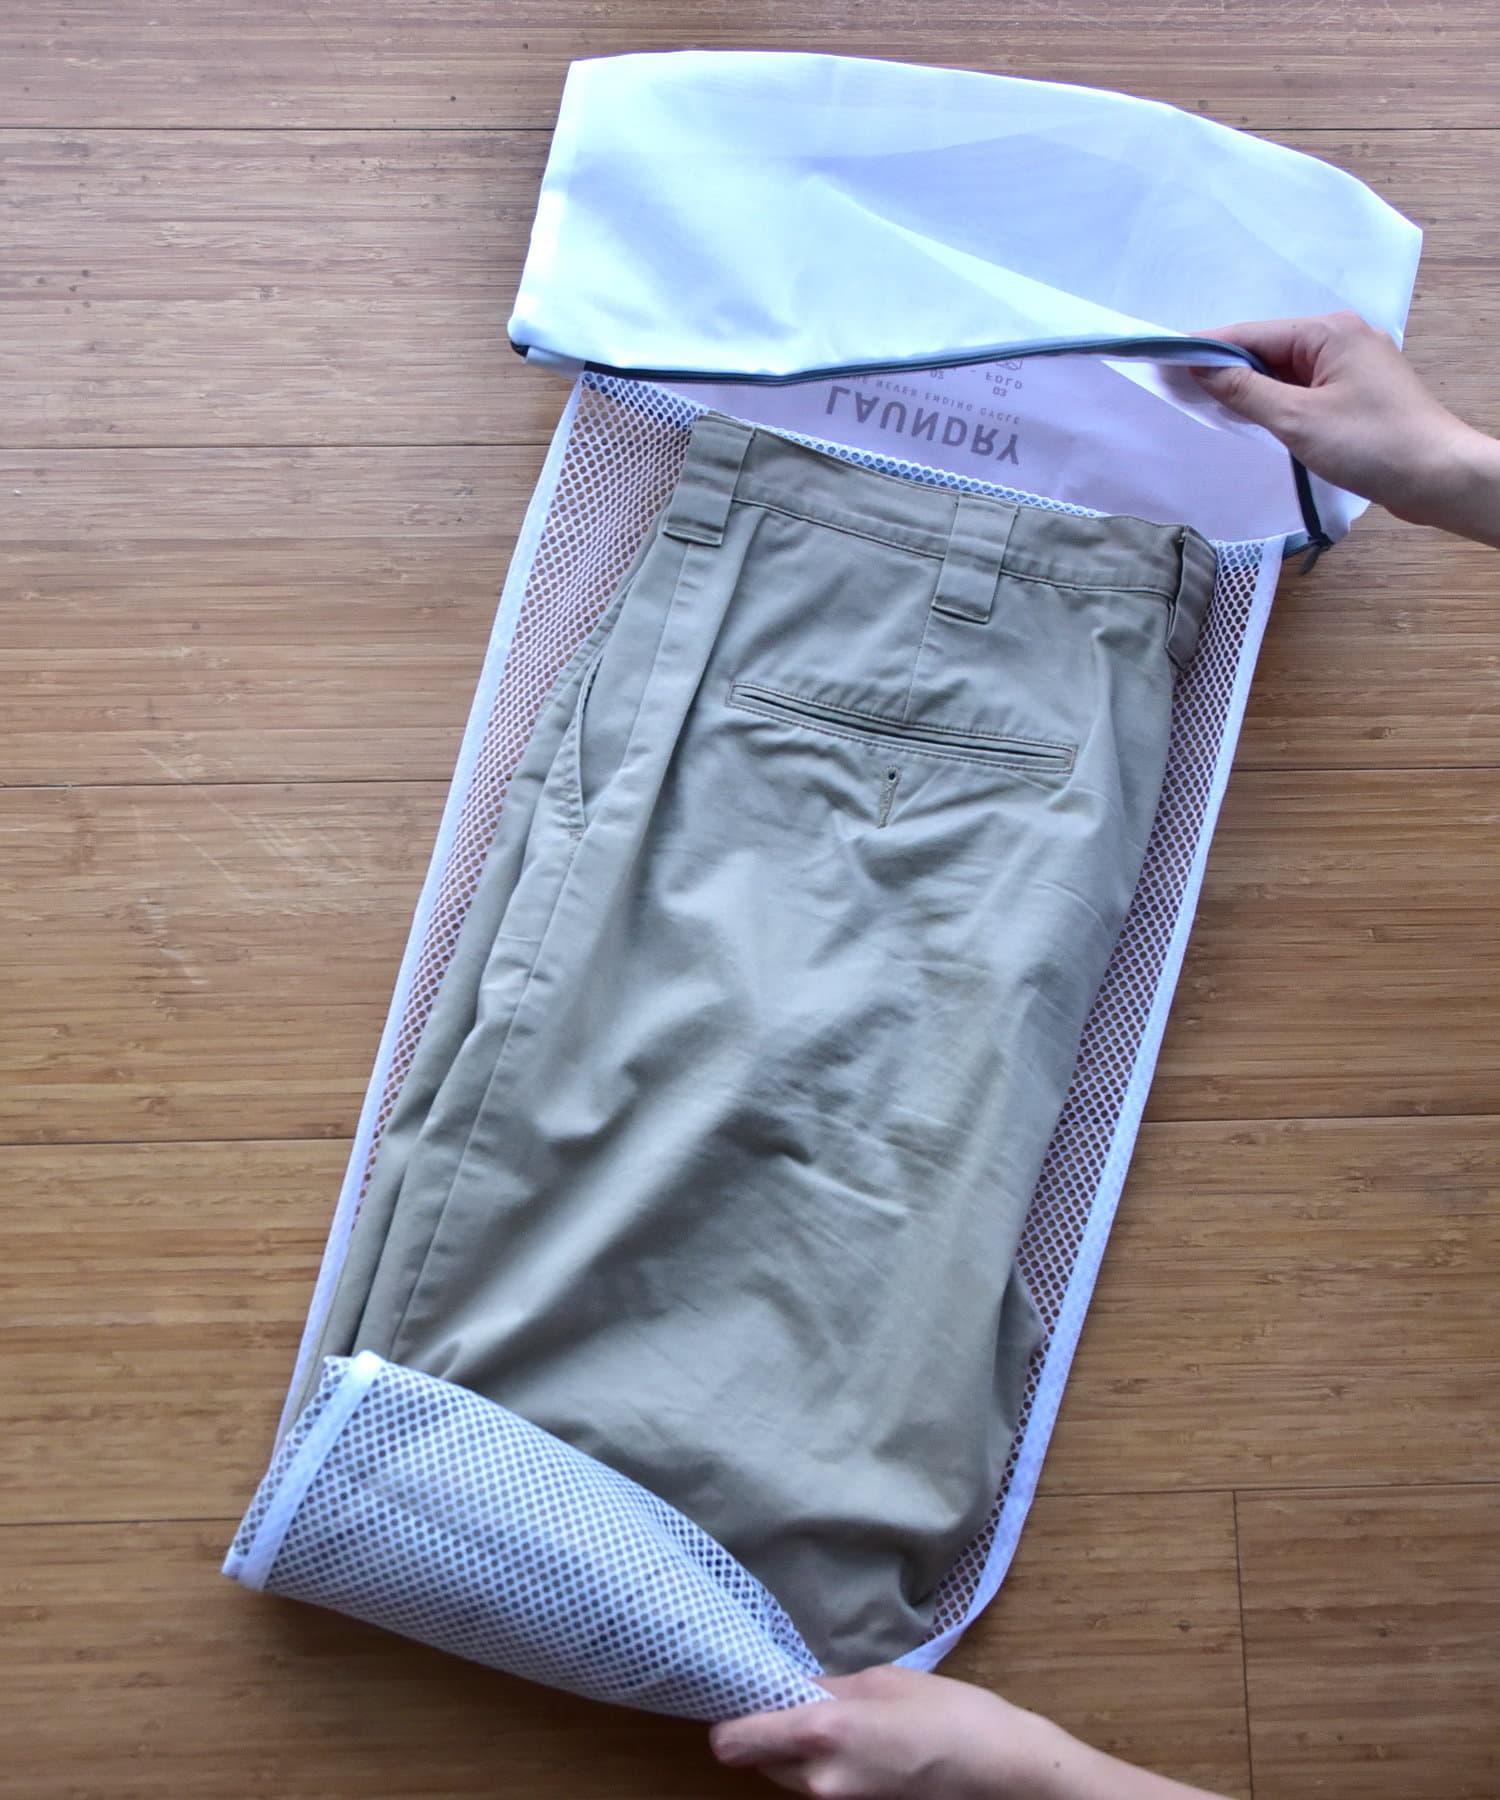 3COINS(スリーコインズ) ライフスタイル 【お洗濯をより快適に】パンツ用ランドリーネット グレー